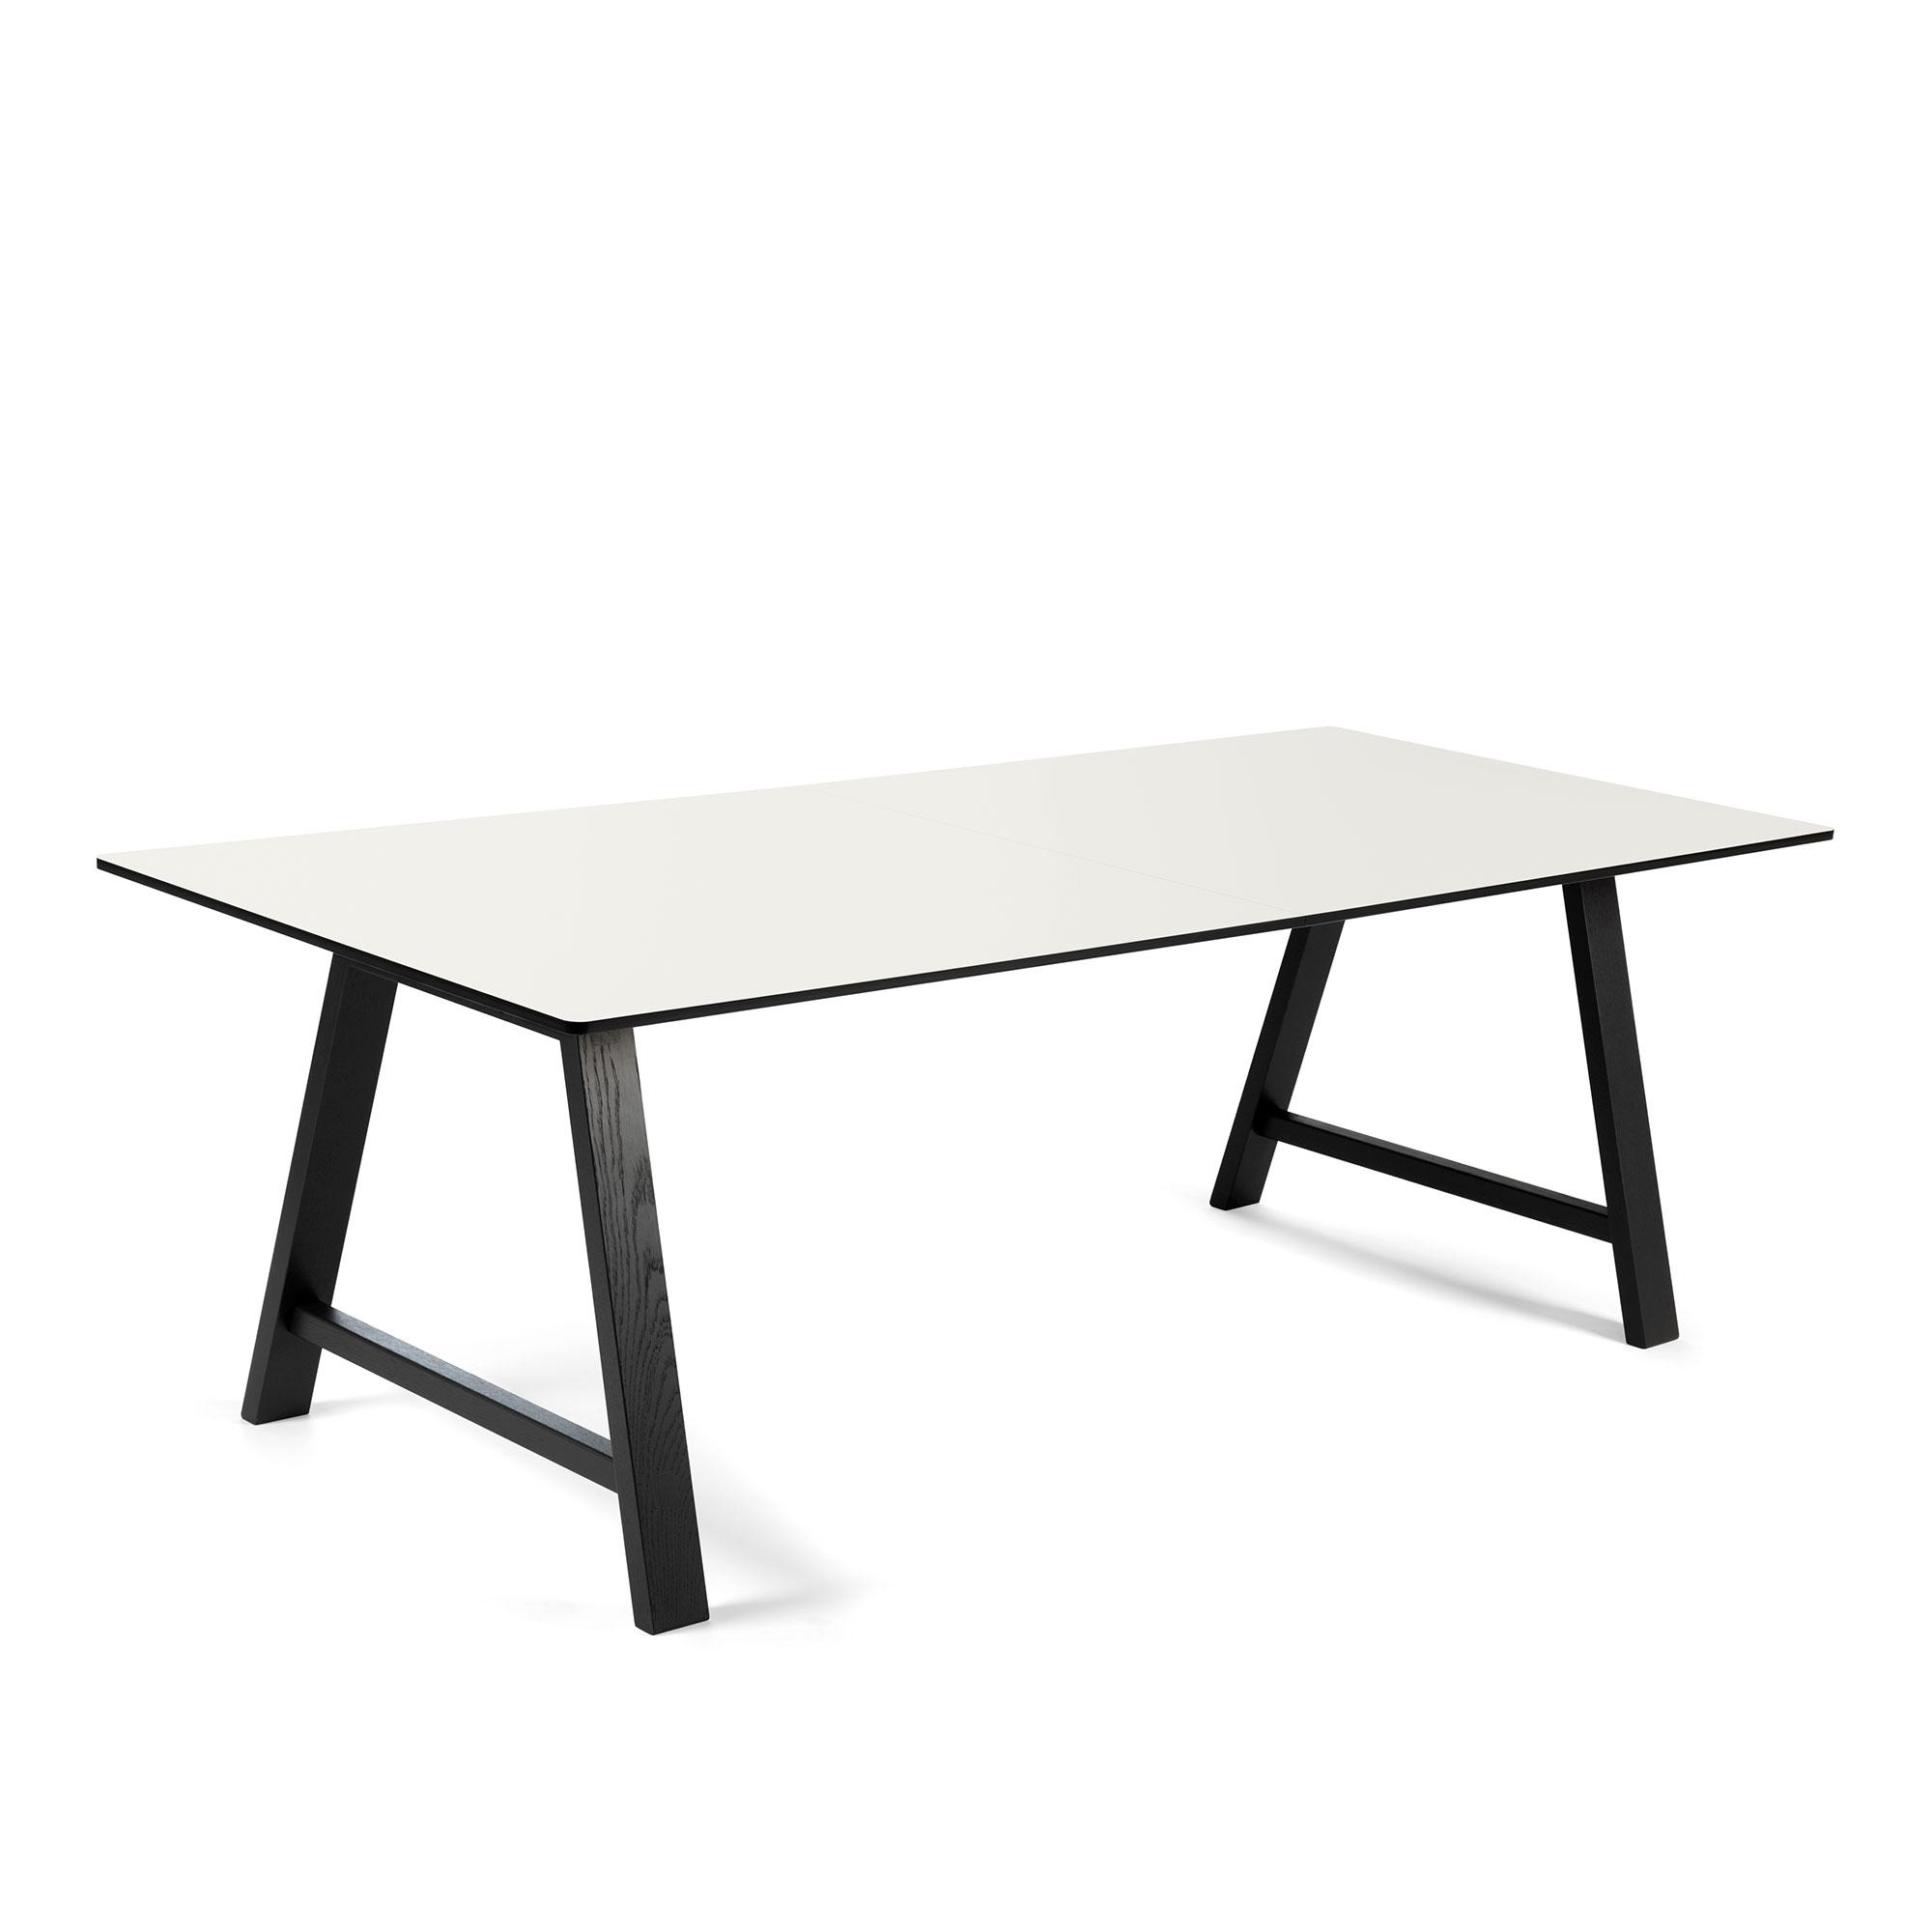 Andersen Furniture T1 Matbord m. iläggsskiva 160cm